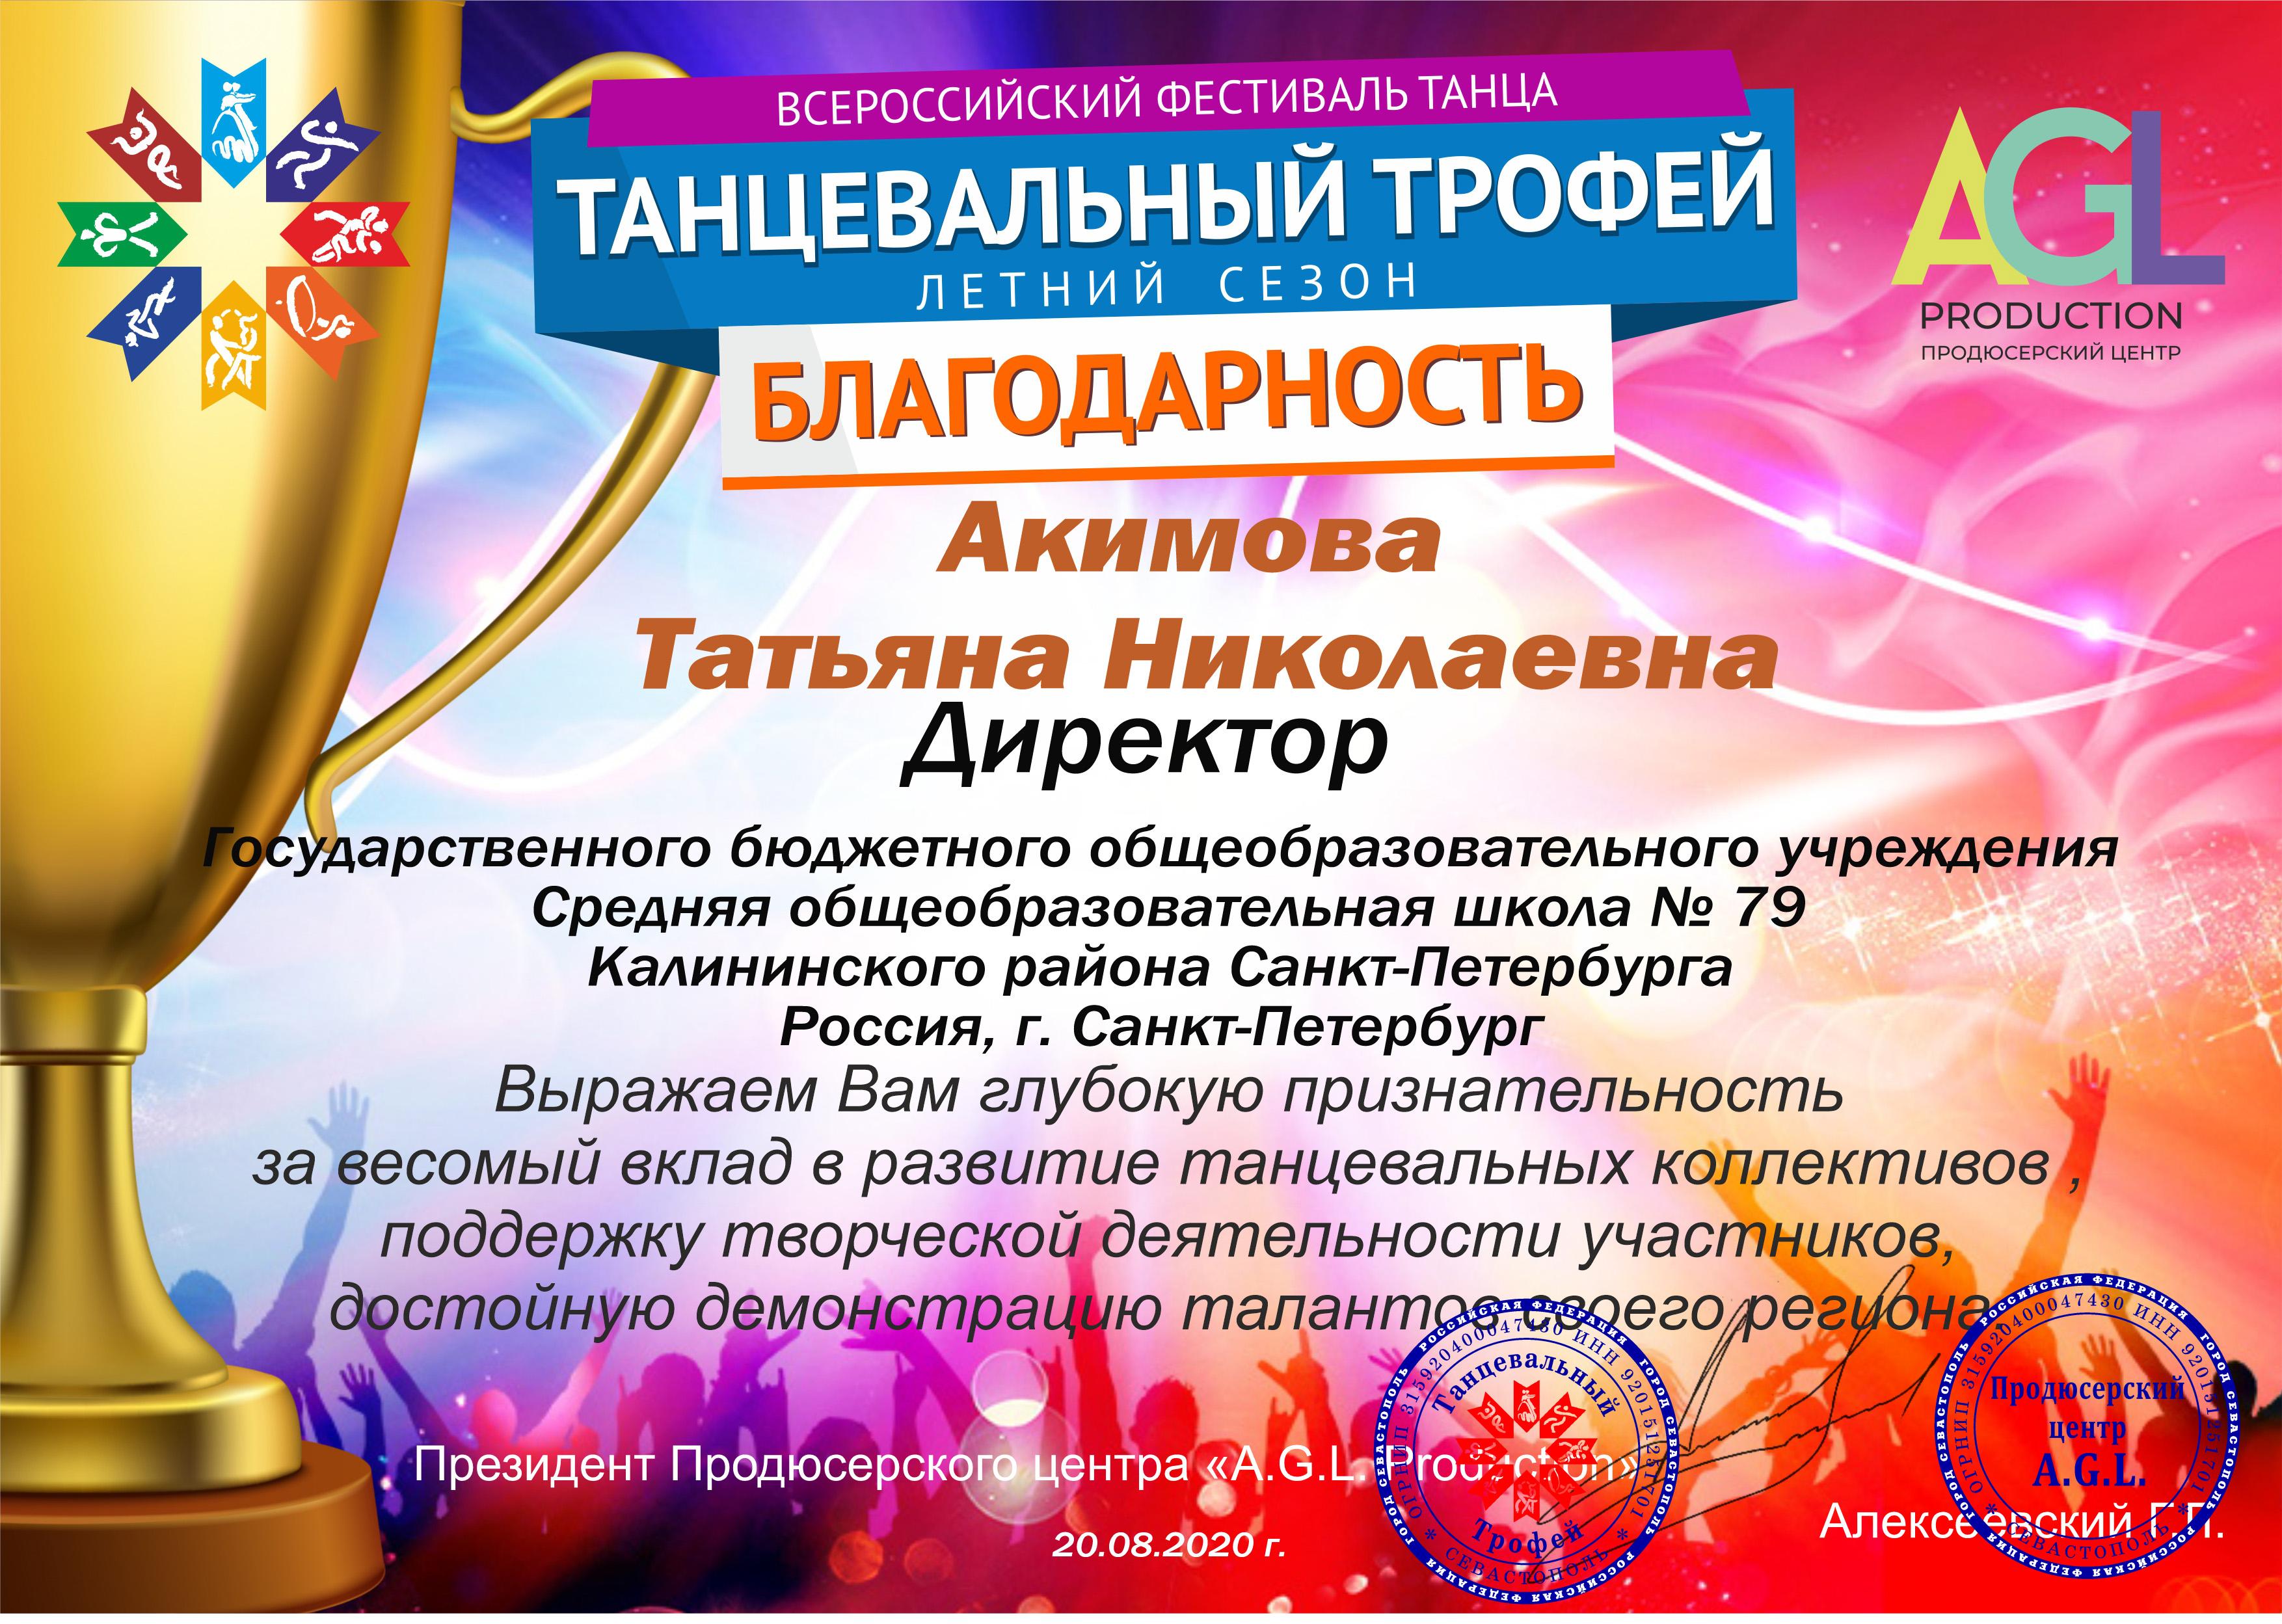 Akimova_Tatyana_Nikolaevna